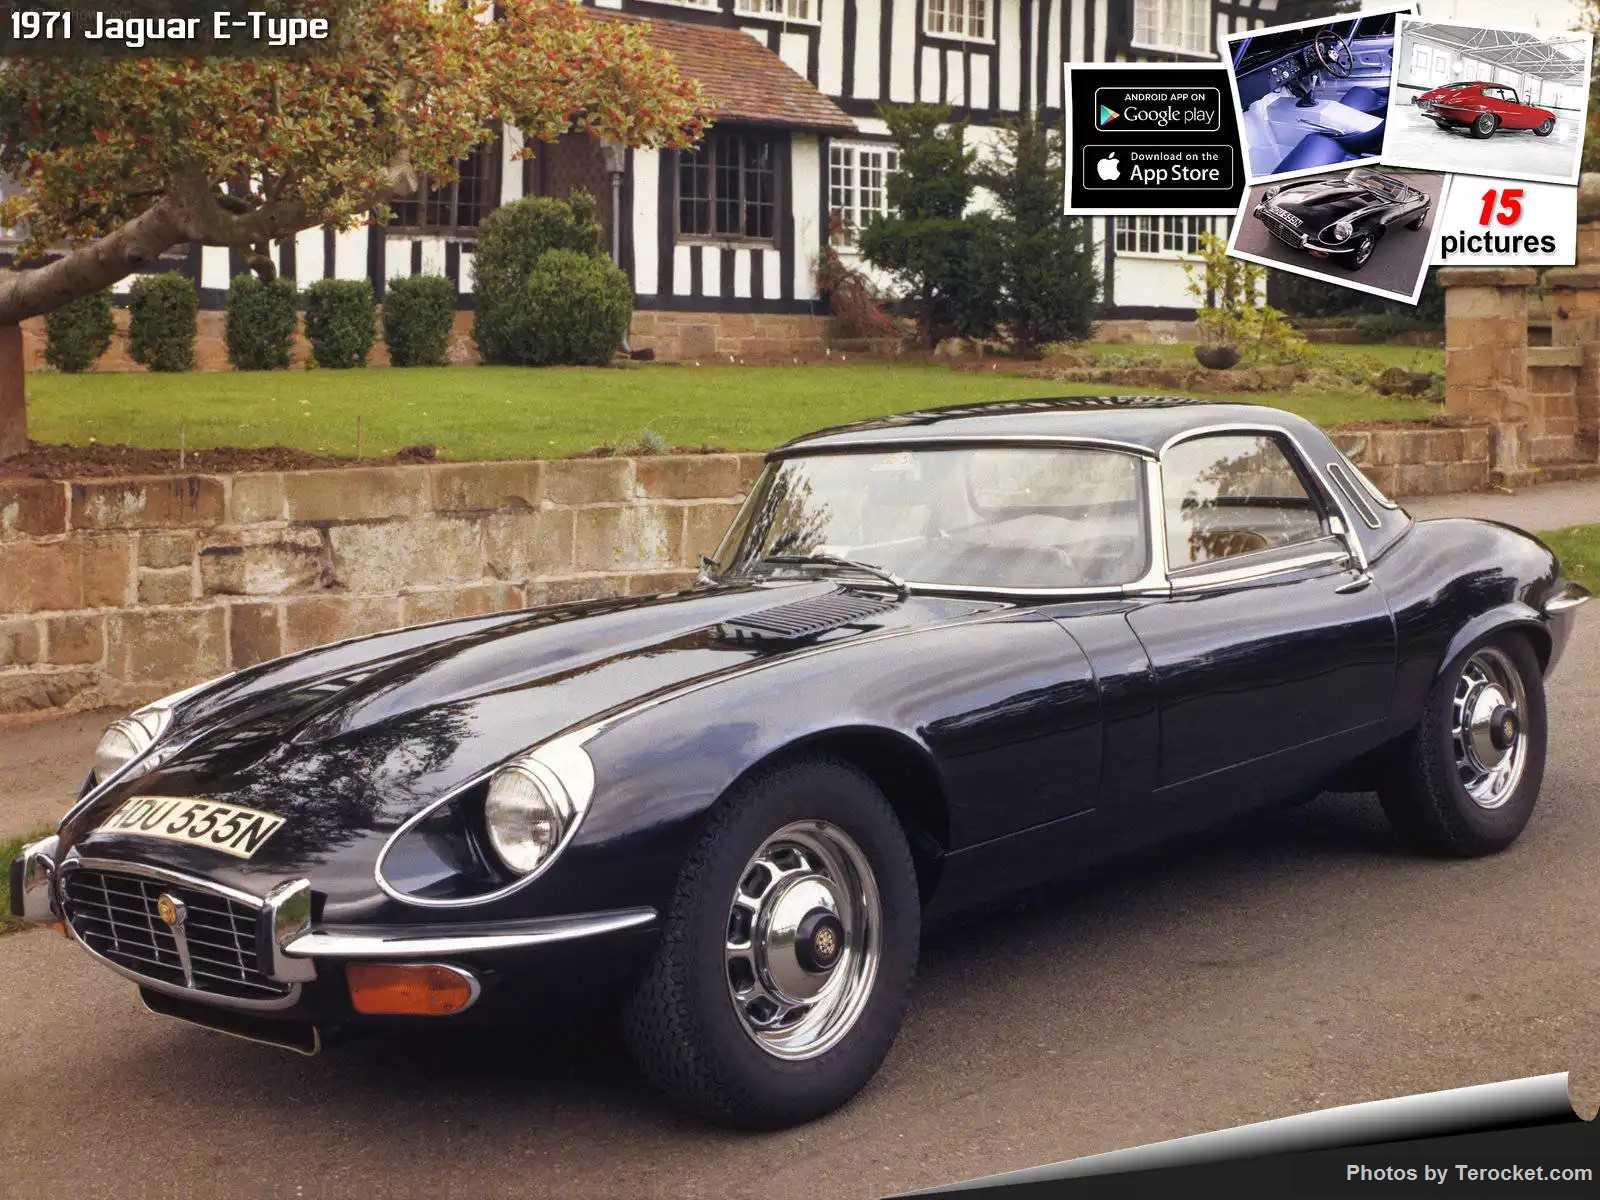 Hình ảnh xe ô tô Jaguar E-Type 1971 & nội ngoại thất